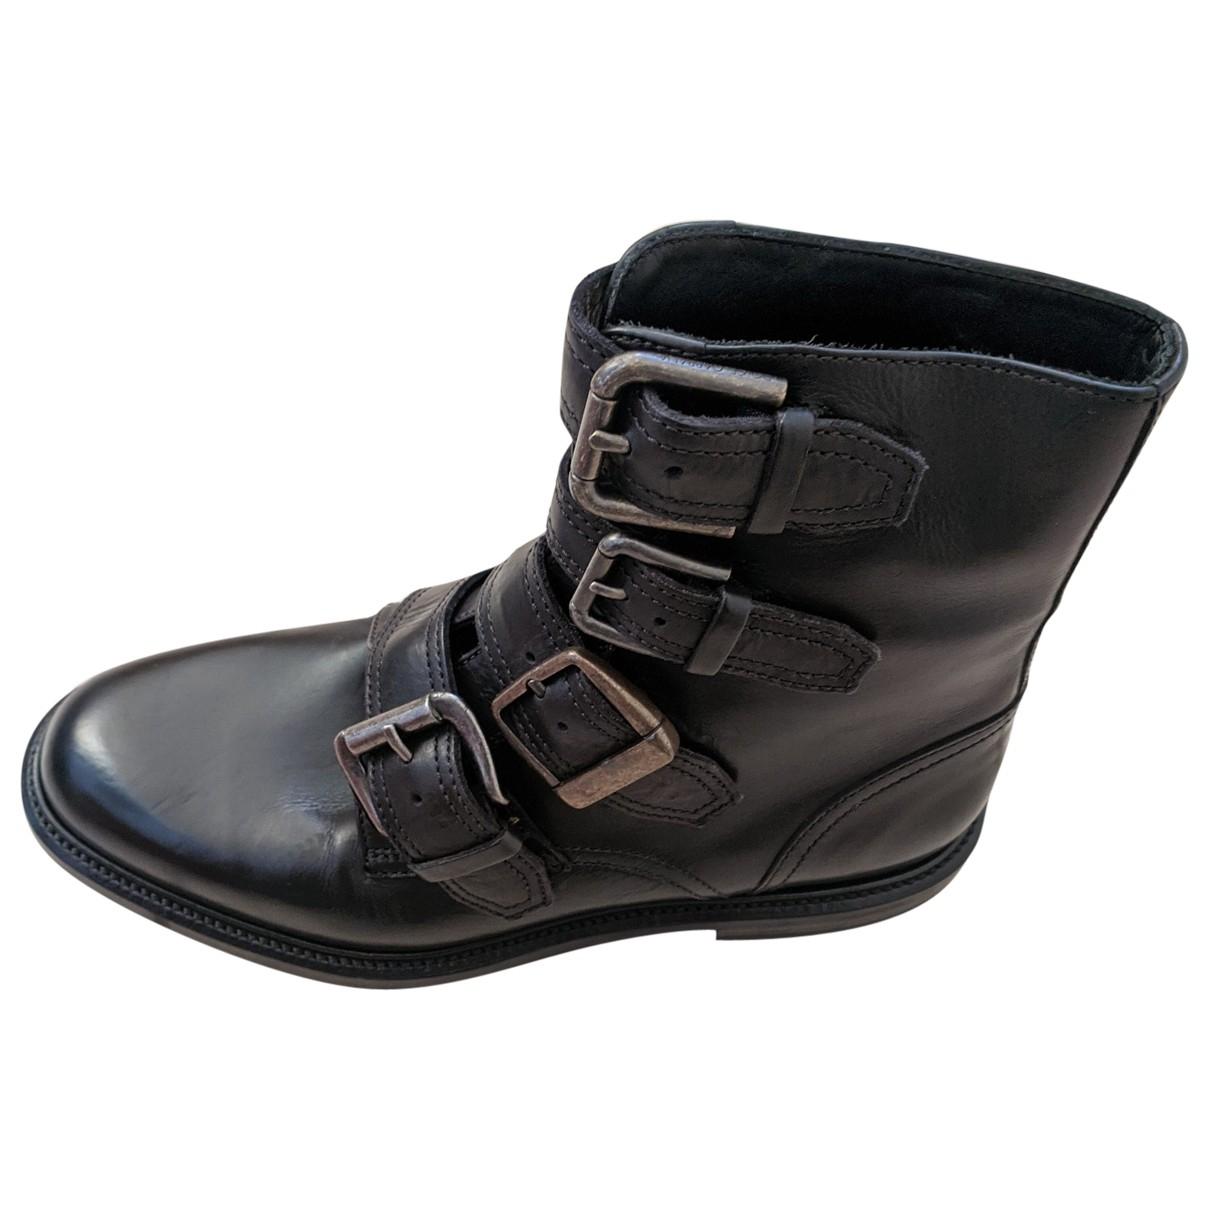 Dolce & Gabbana \N Black Leather Boots for Men 7 UK